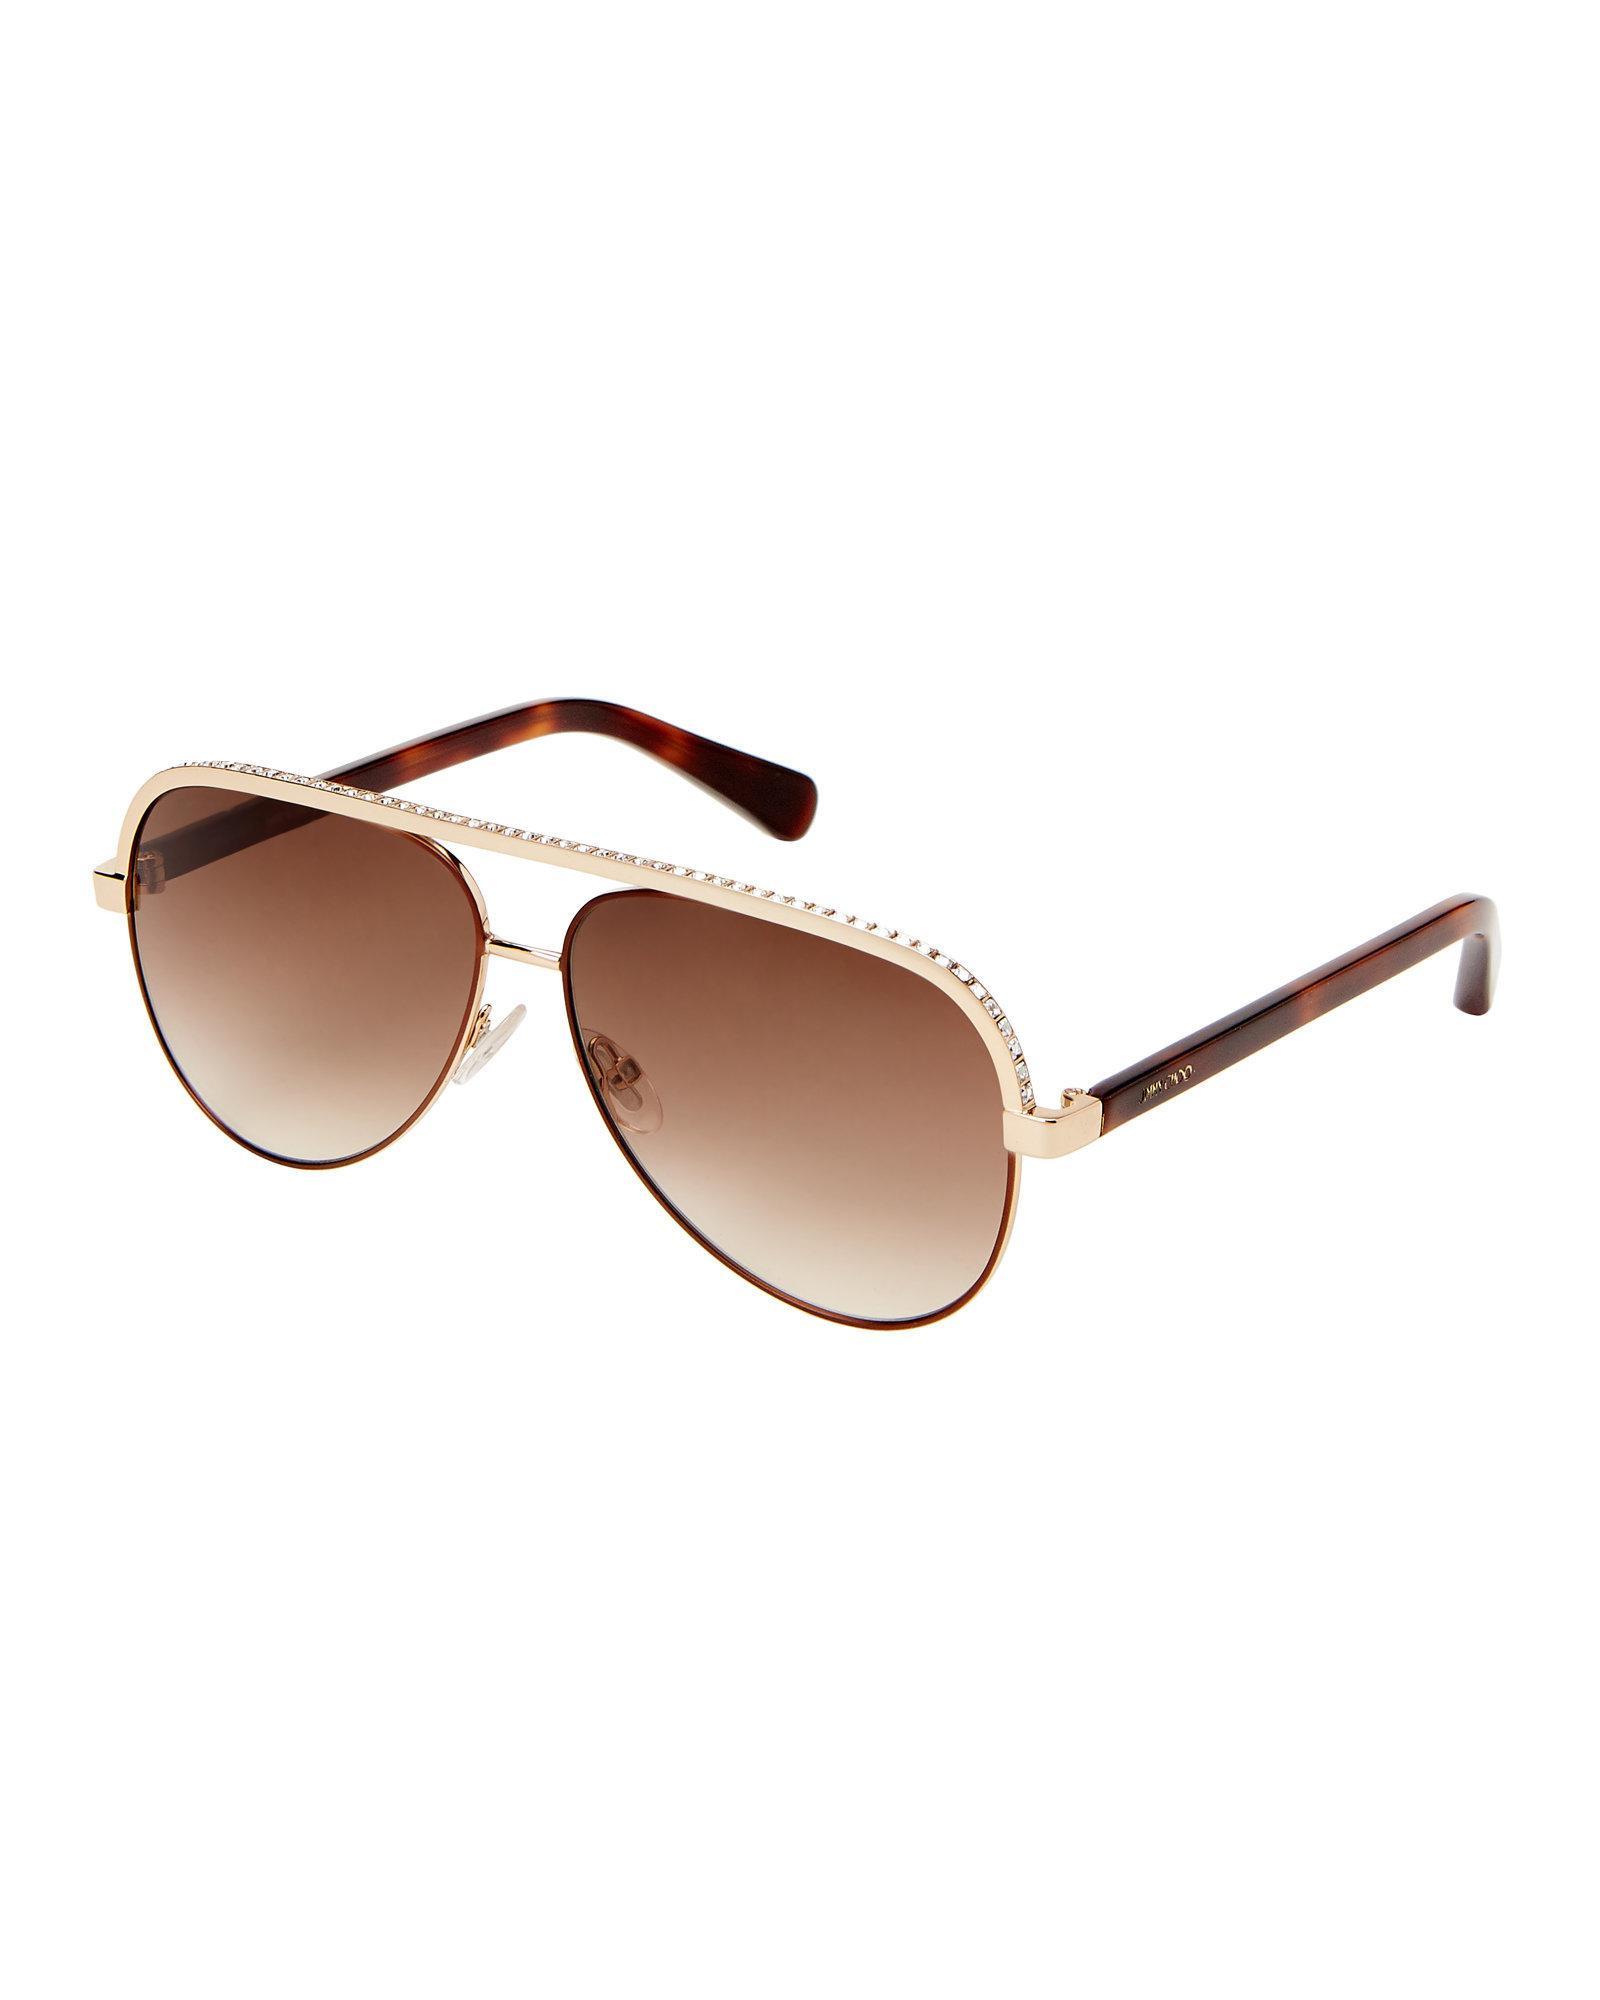 6dd23636e26 Lyst - Jimmy Choo Lina s Rhinestone Brow Aviator Sunglasses in Brown